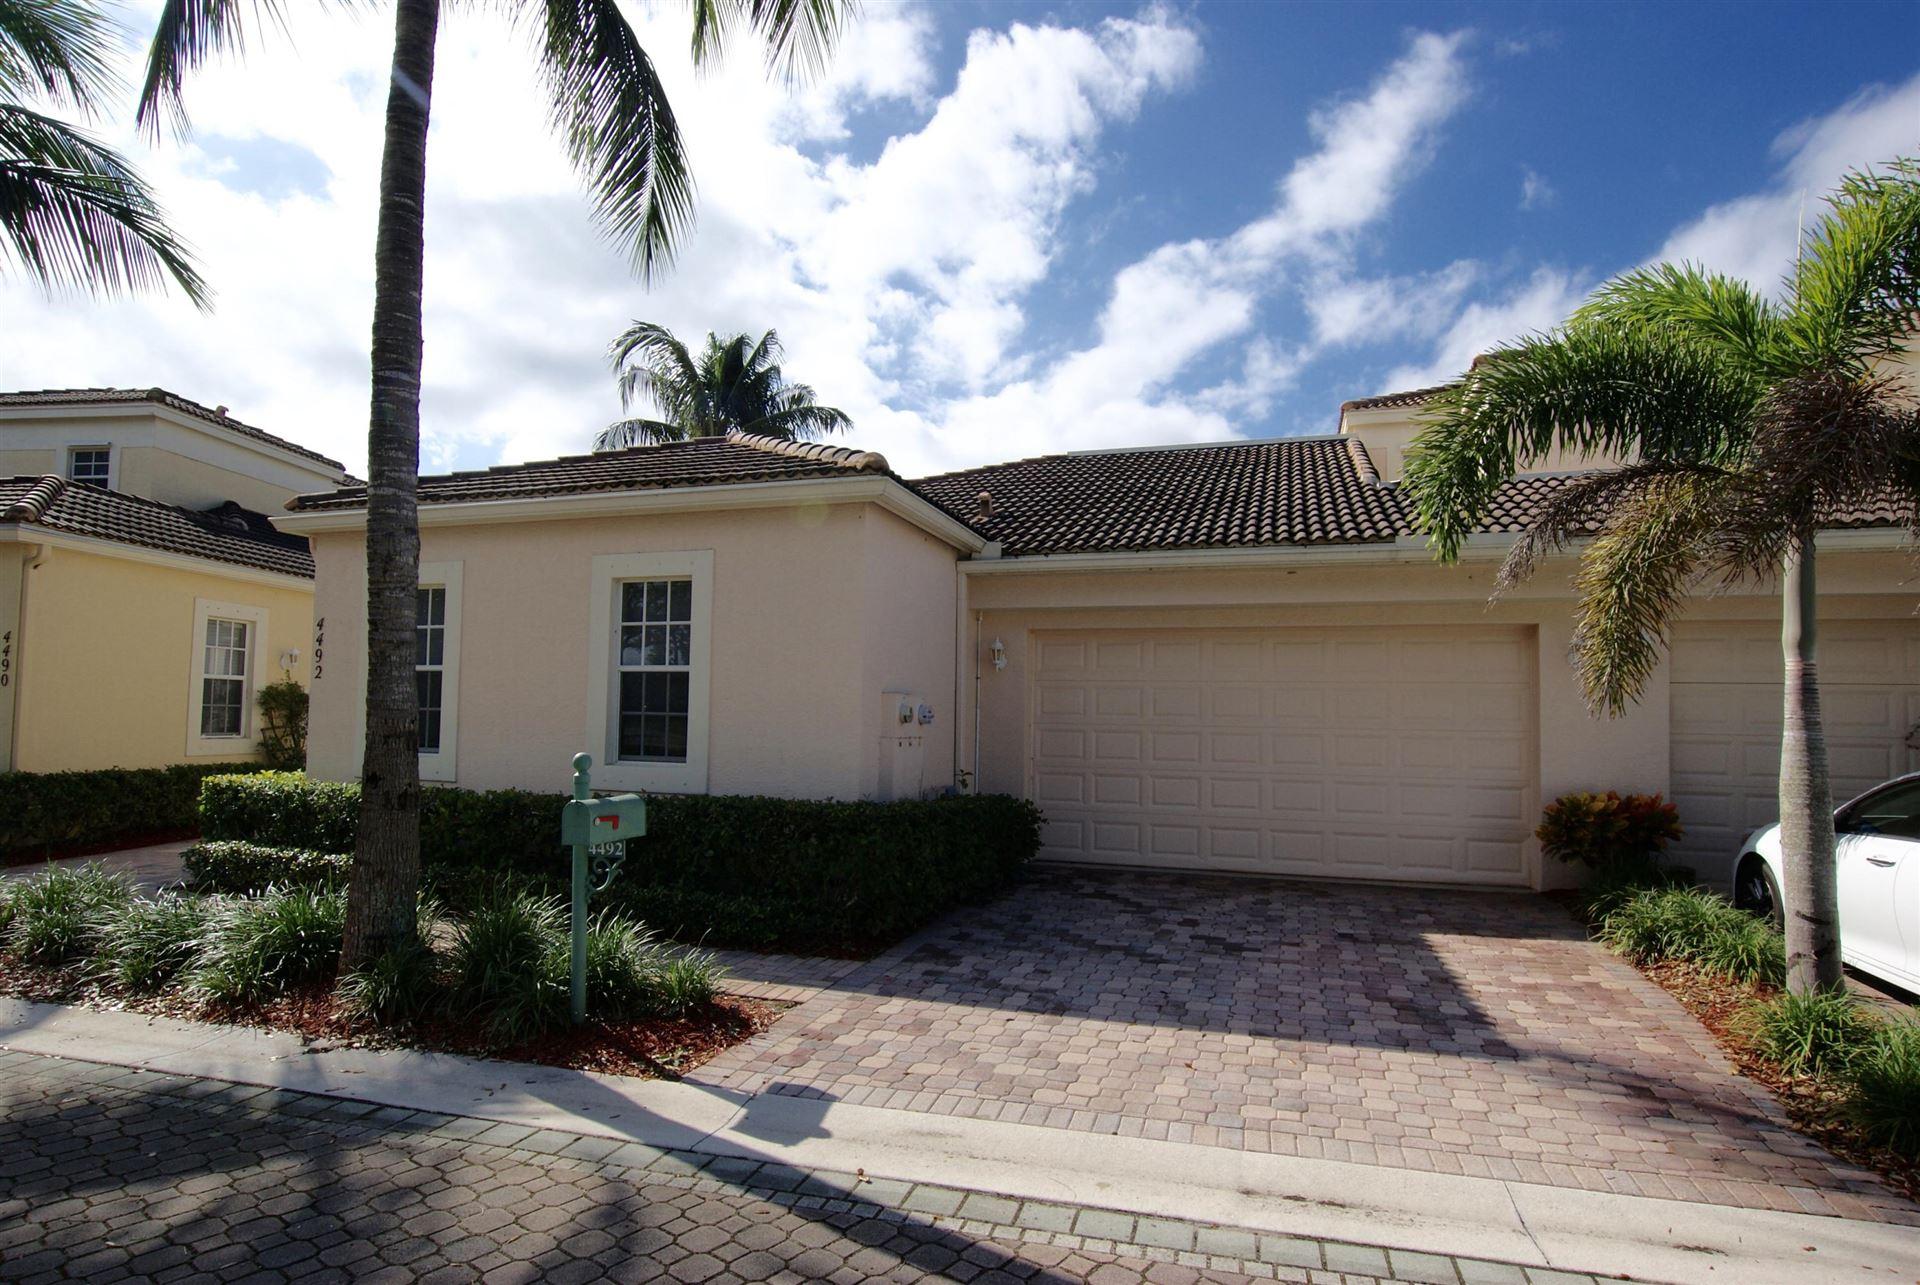 Photo of 4492 Hickory Drive, Palm Beach Gardens, FL 33418 (MLS # RX-10672478)